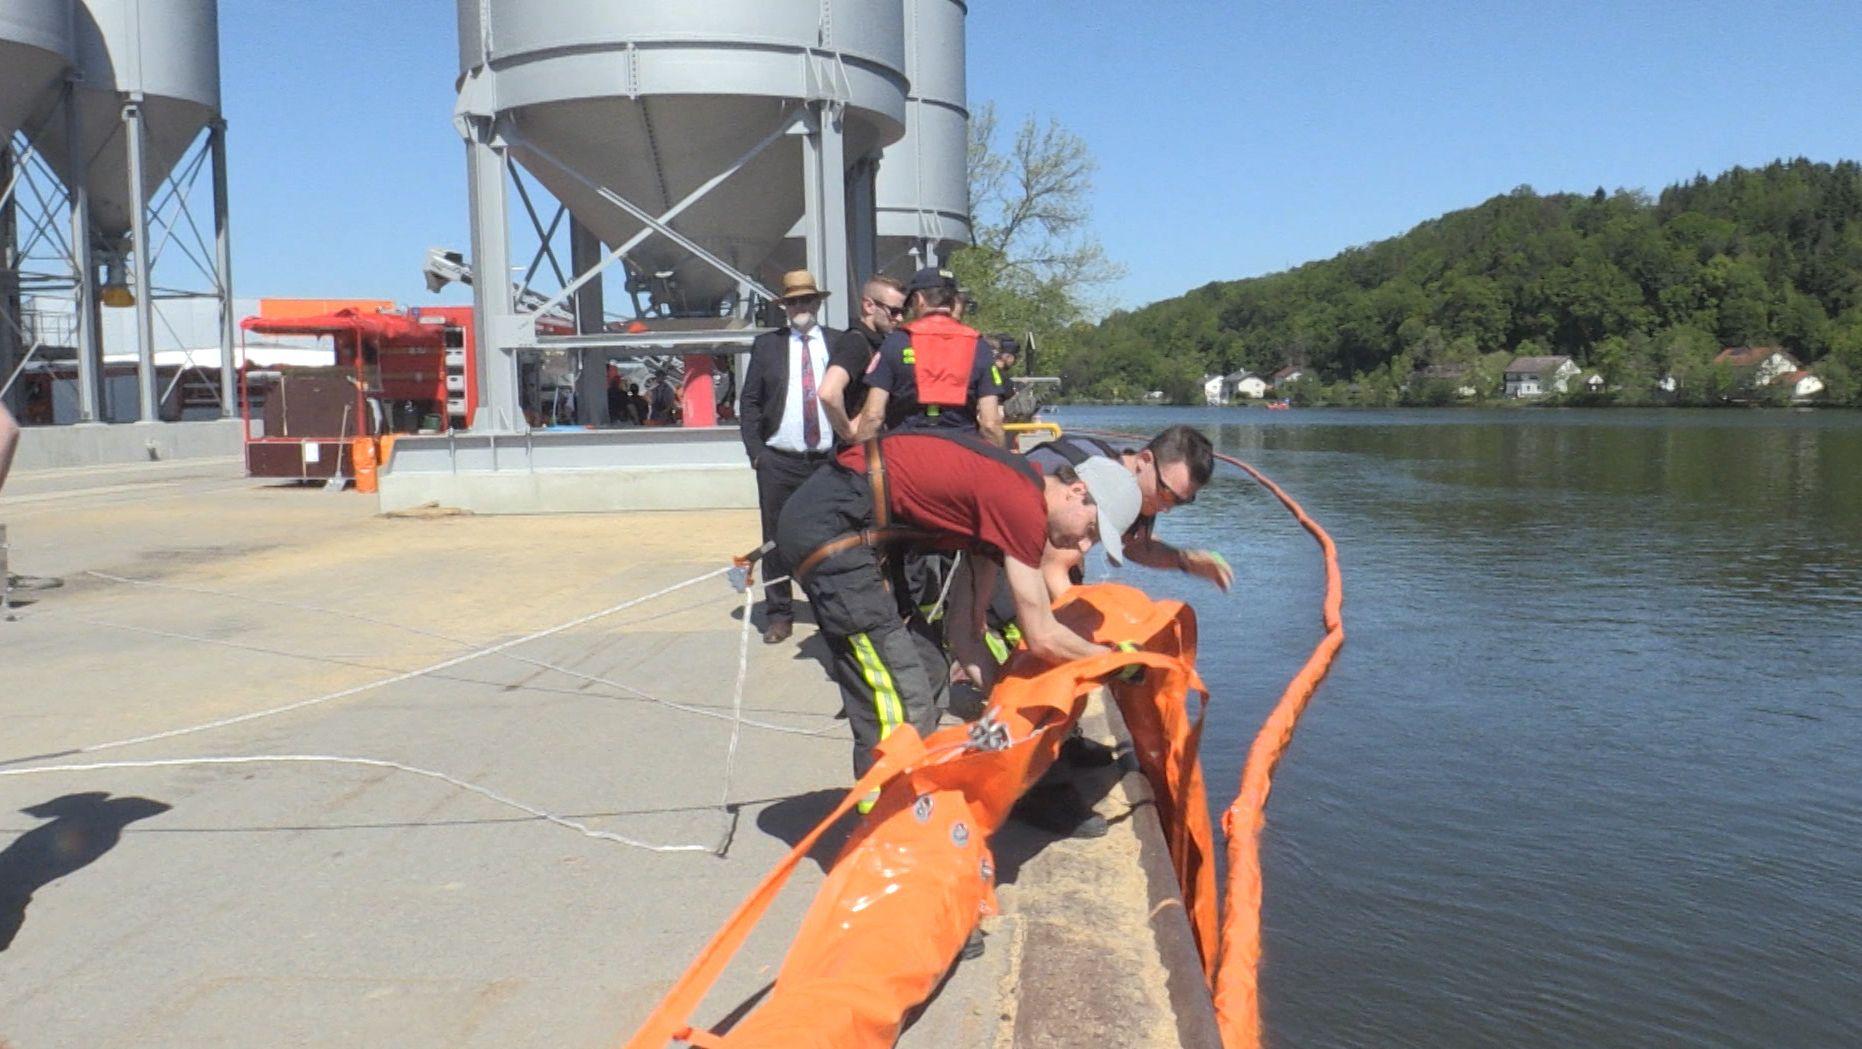 Ölwehrübung an der Donau